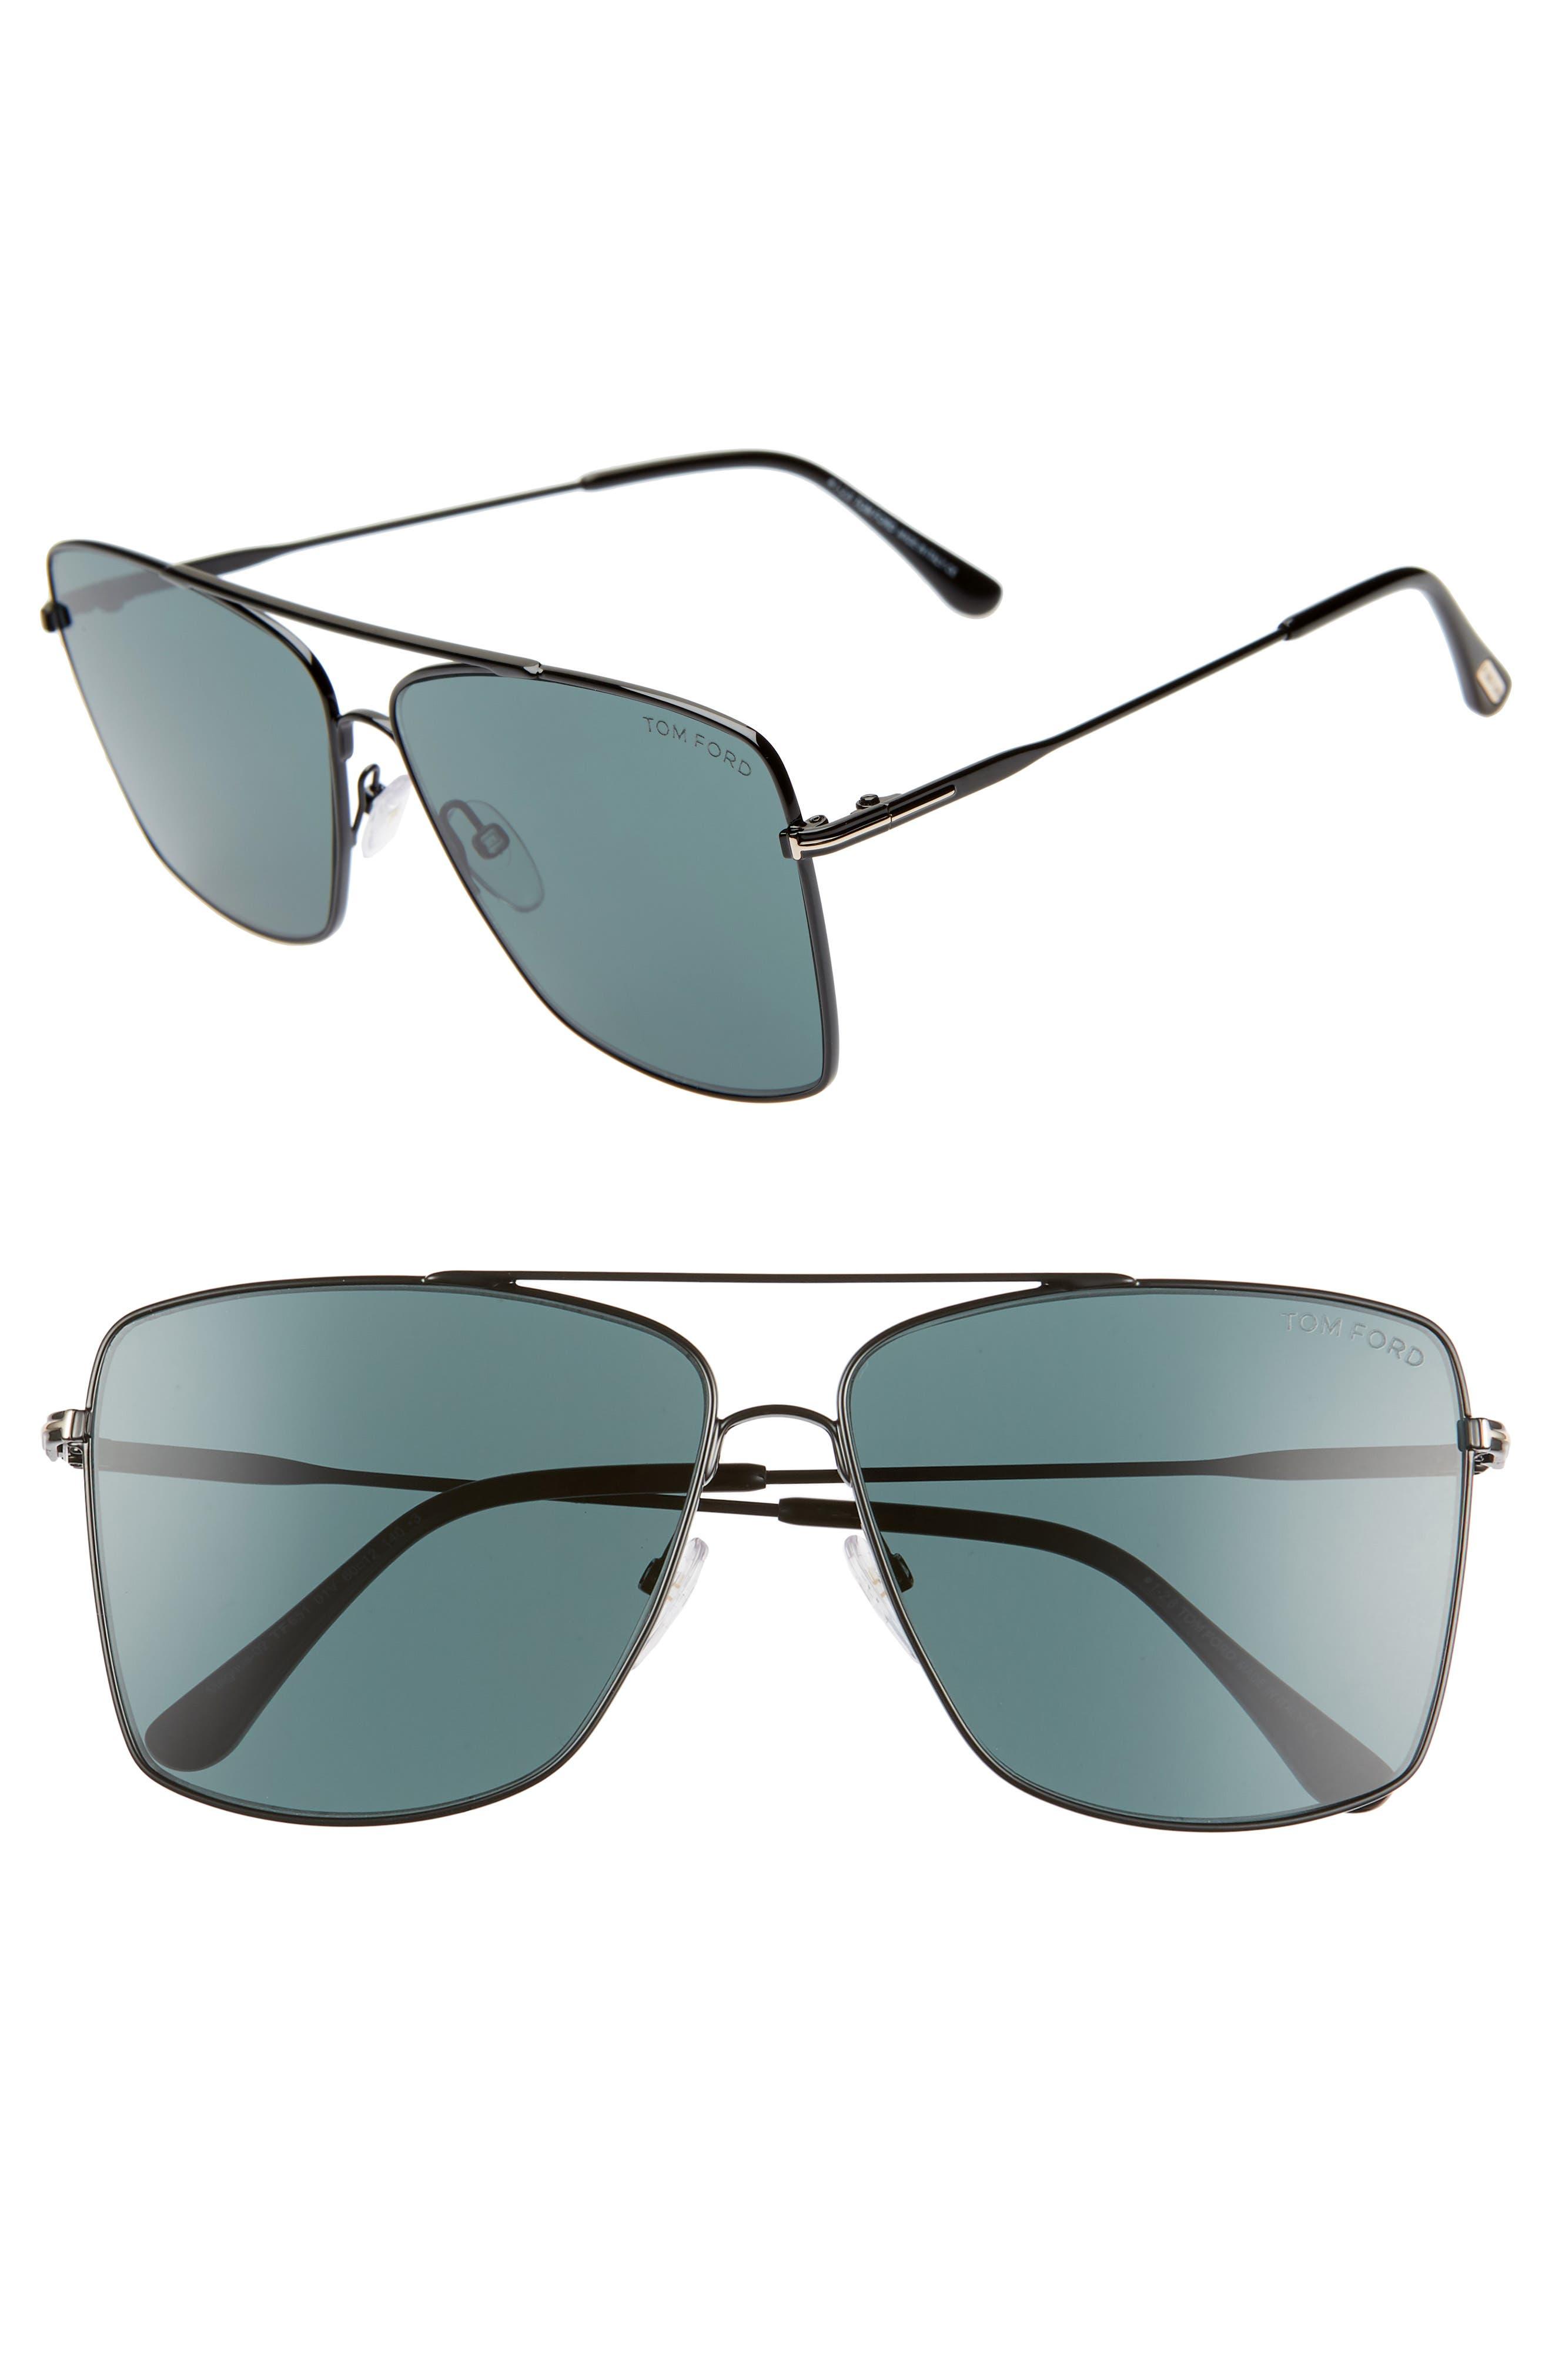 Magnus 60mm Aviator Sunglasses,                             Main thumbnail 1, color,                             SHINY BLACK/ DARK TEAL